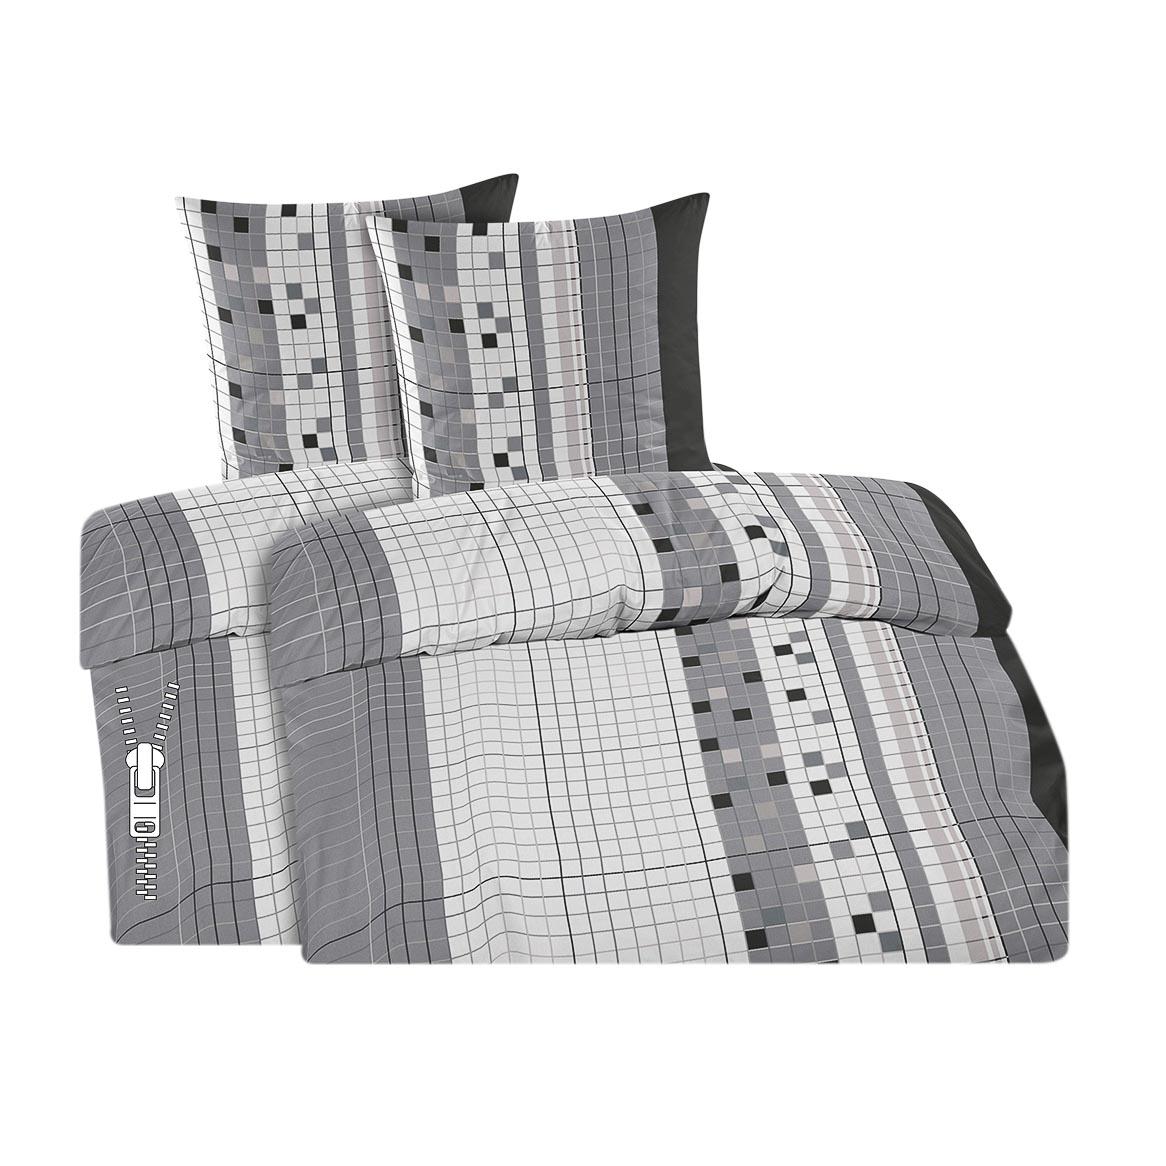 4 teilige feinbiber bettw sche 2 x bettbezug 135x200 2 x kissenbezug 80x80cm ebay. Black Bedroom Furniture Sets. Home Design Ideas